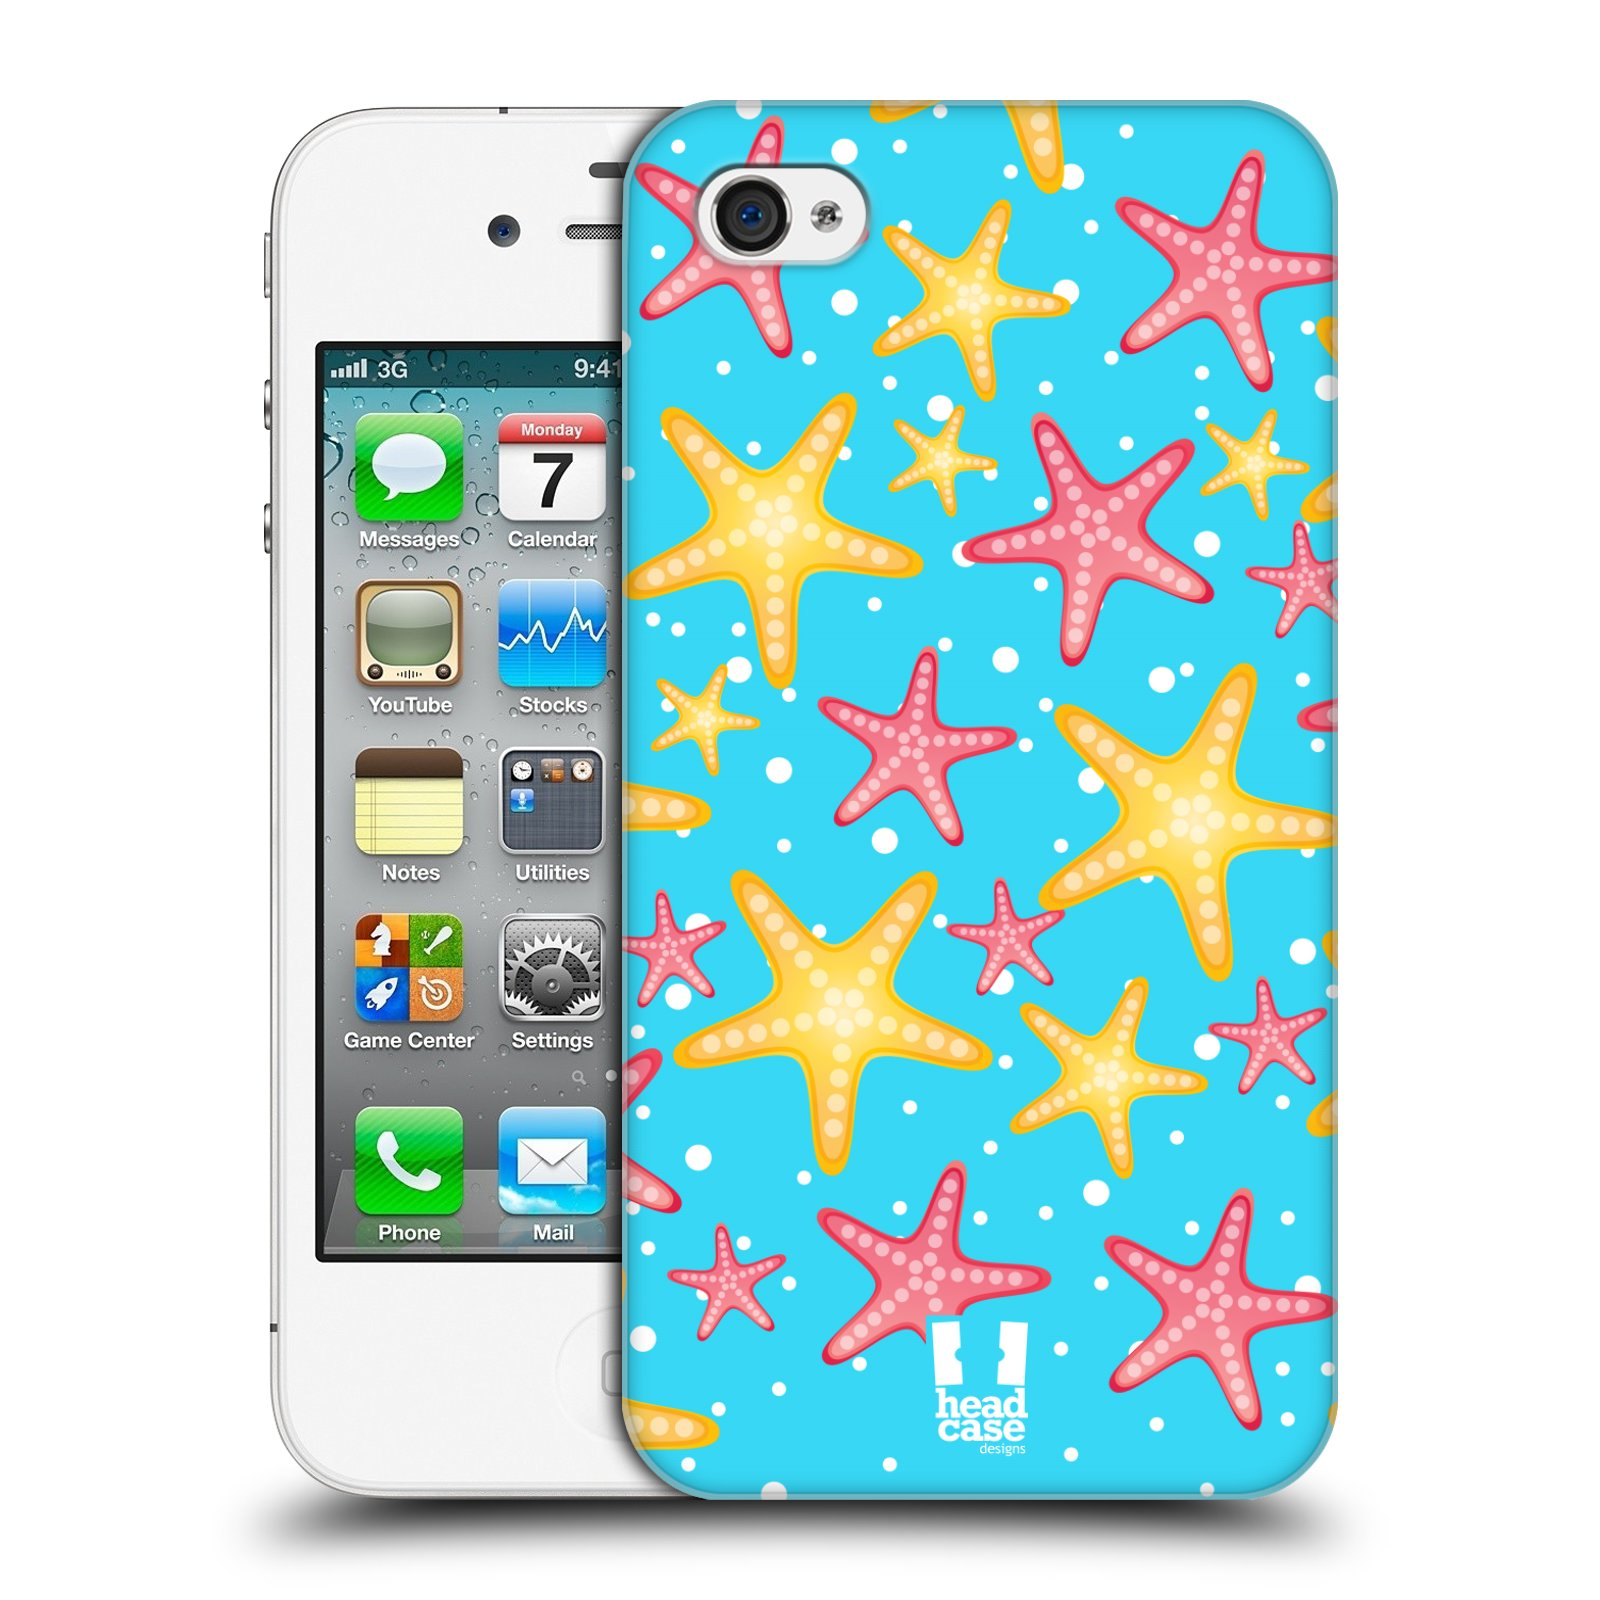 HEAD CASE plastový obal na mobil Apple Iphone 4/4S vzor mořský živočich hvězda